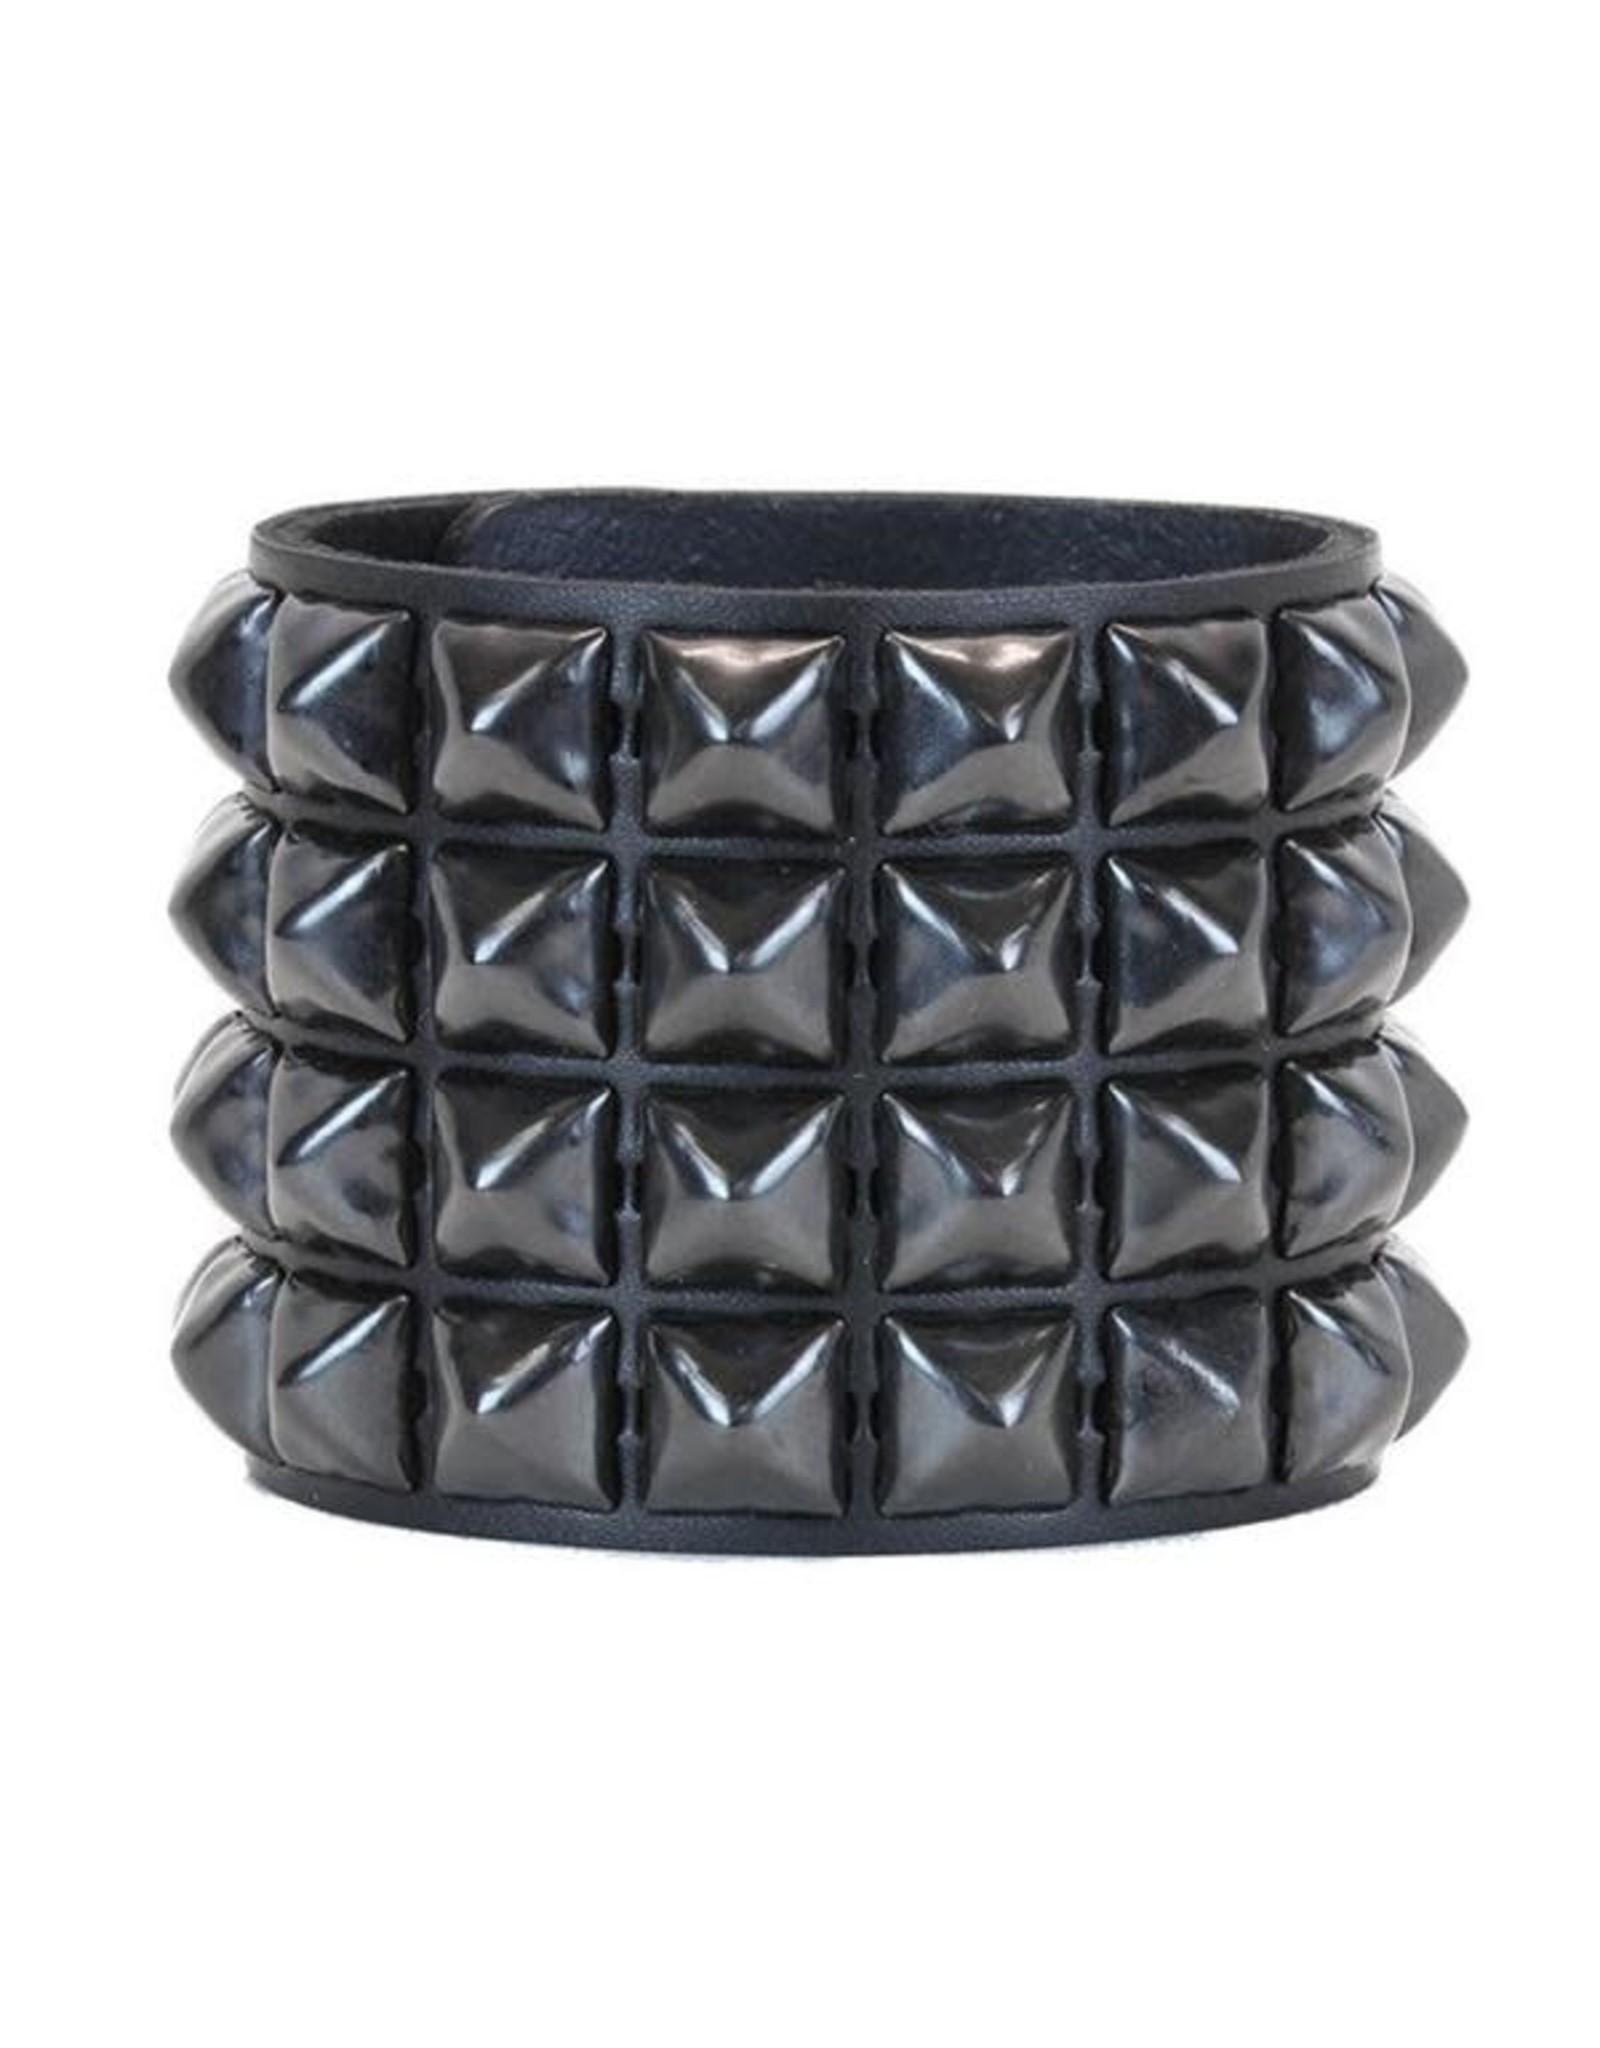 FUNKPLUS - Bracer 4 Rows Black Studs